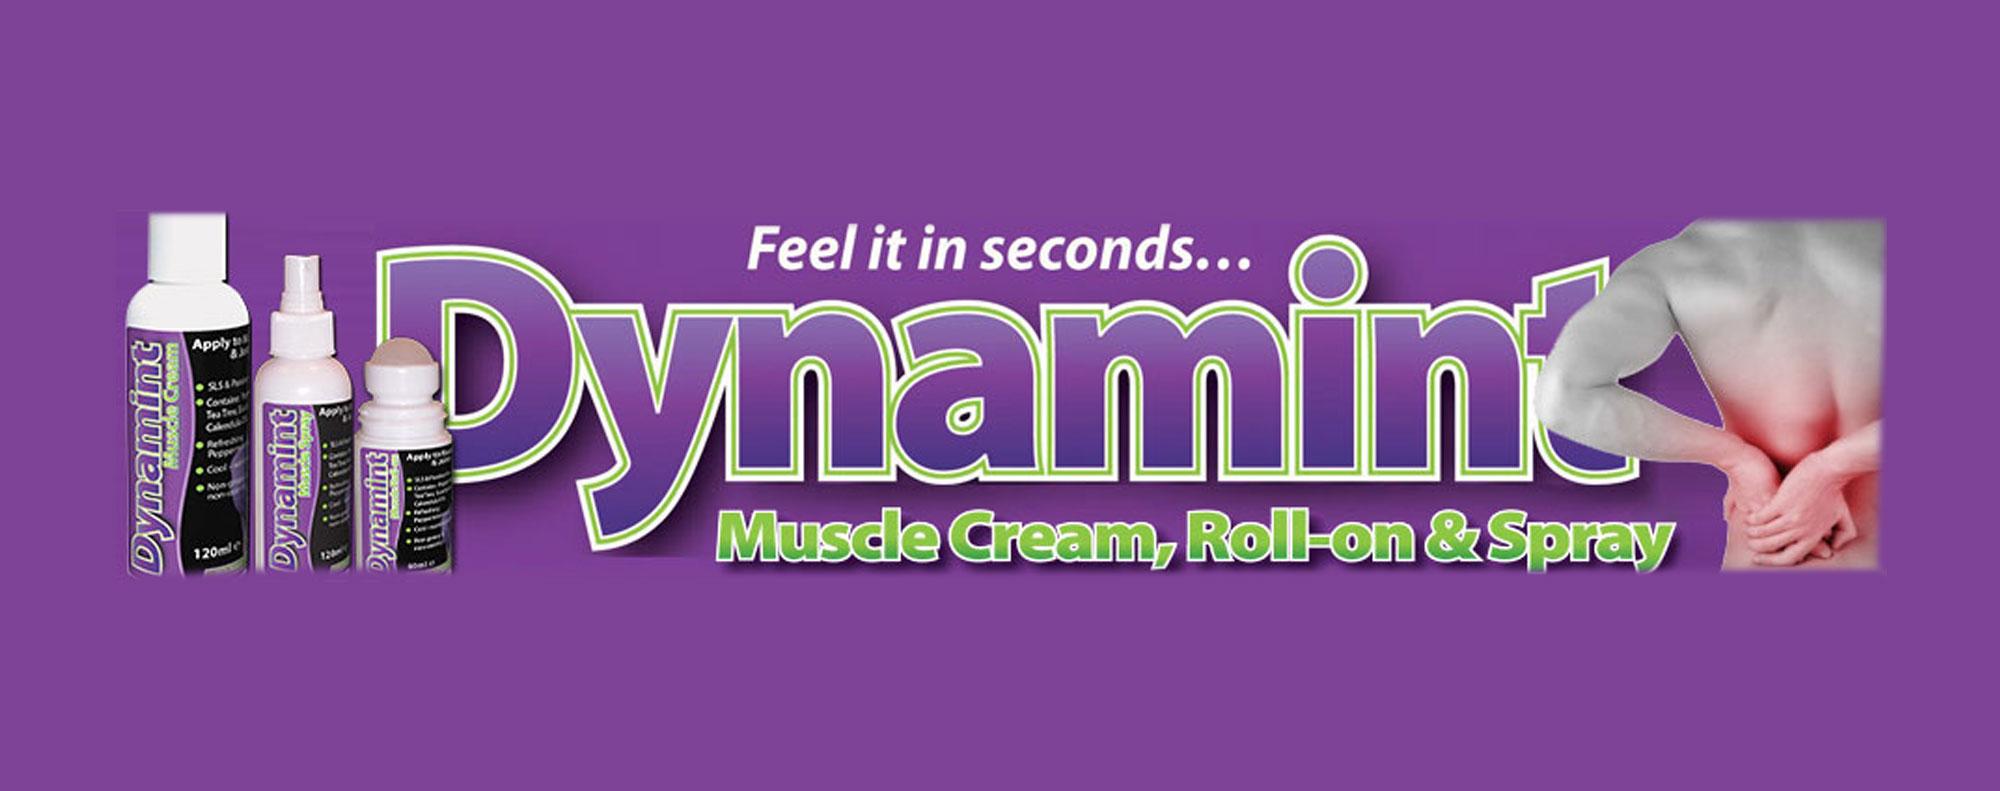 dynamint muscle cream